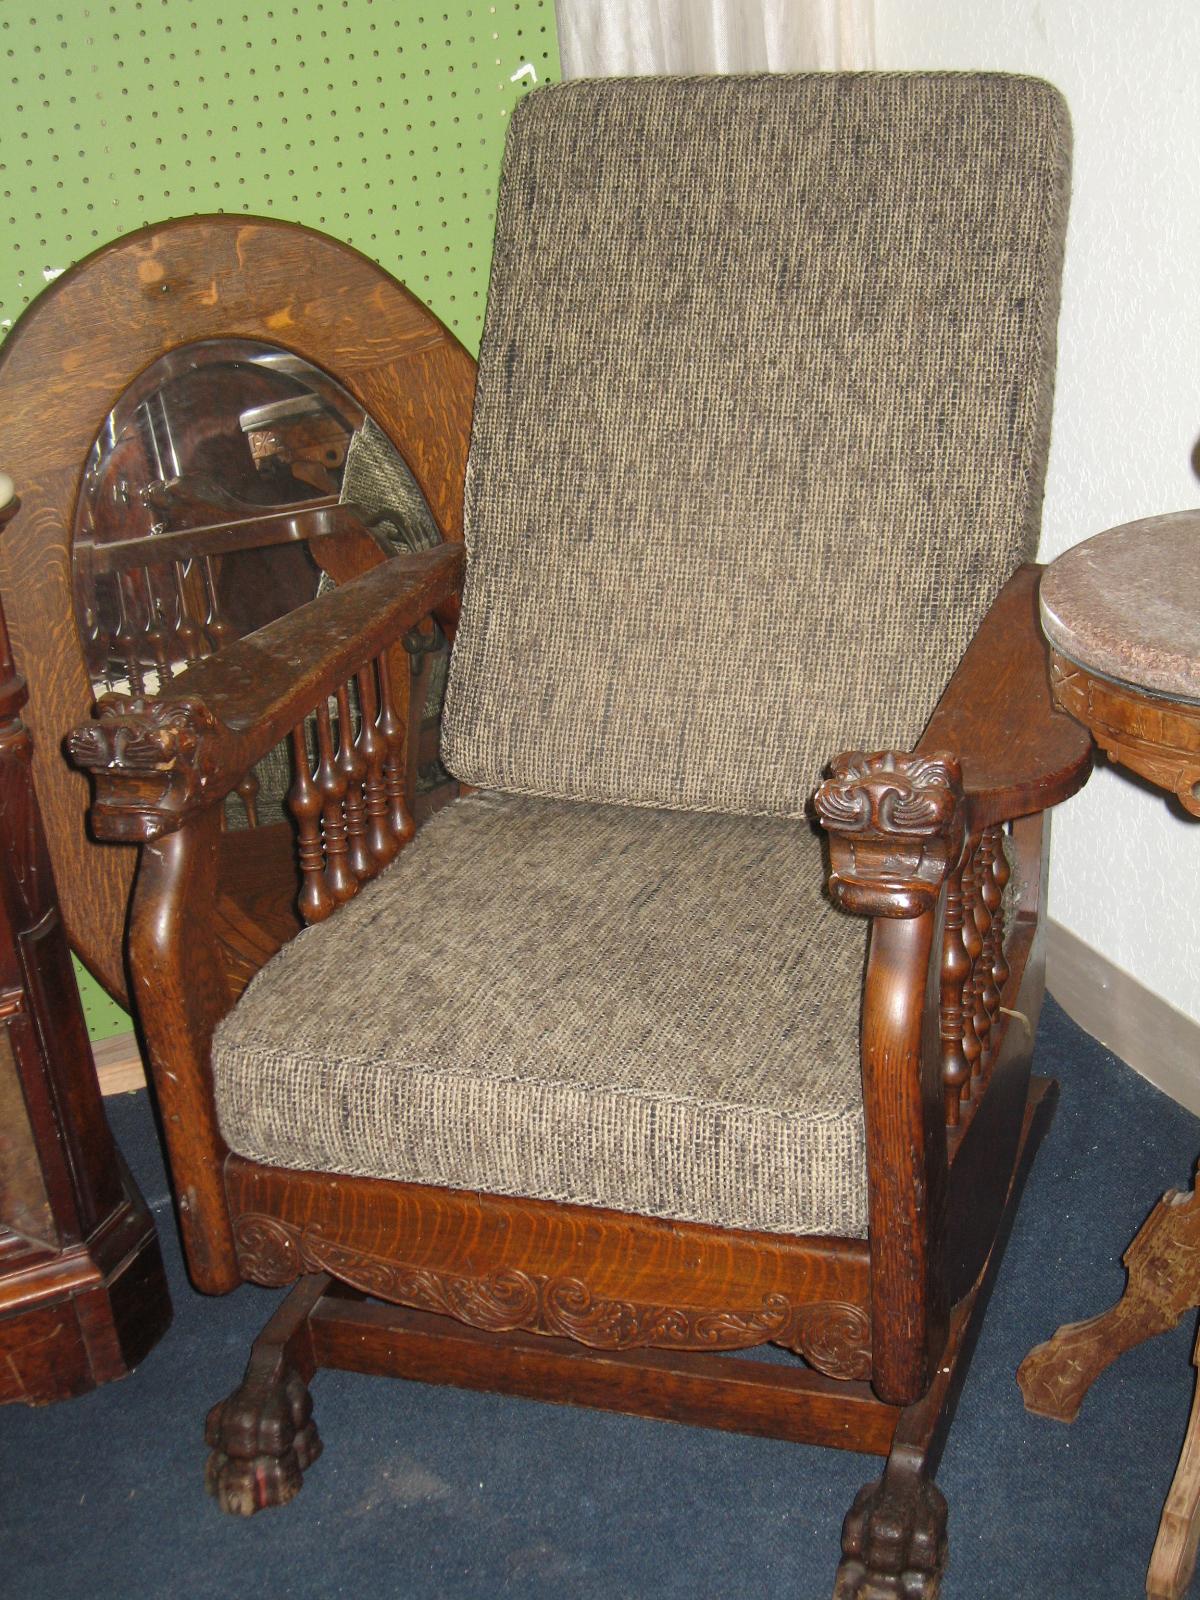 Cooper City Antique Mall Ornate Victorian Furniture